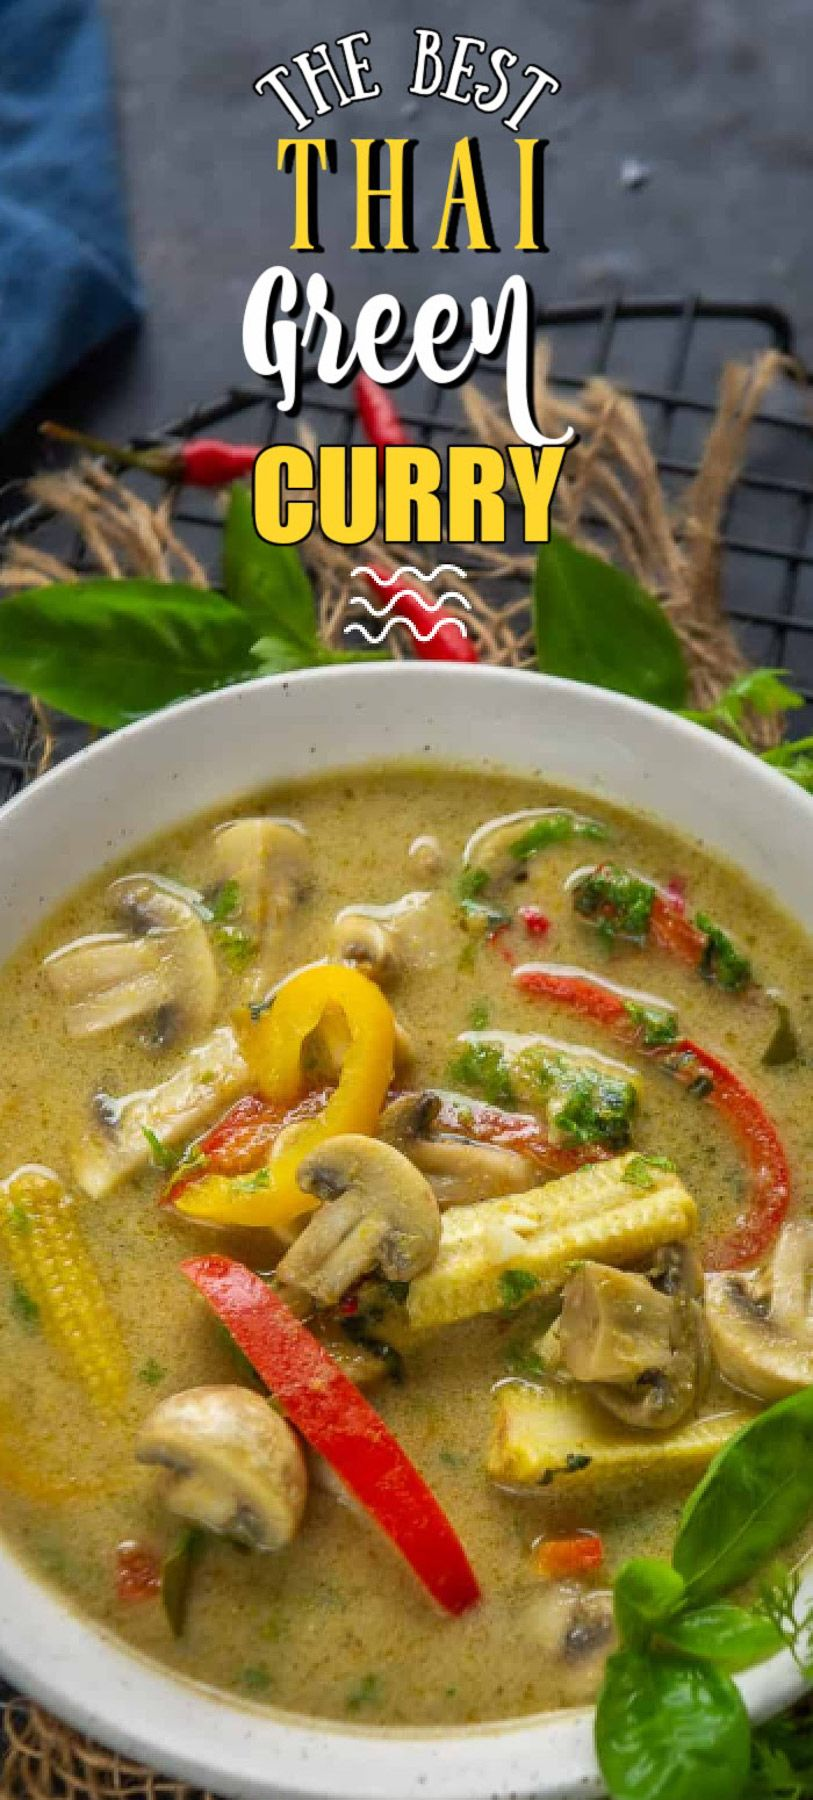 Remarquable  Mot-Clé Best Thai Green Curry Recipe